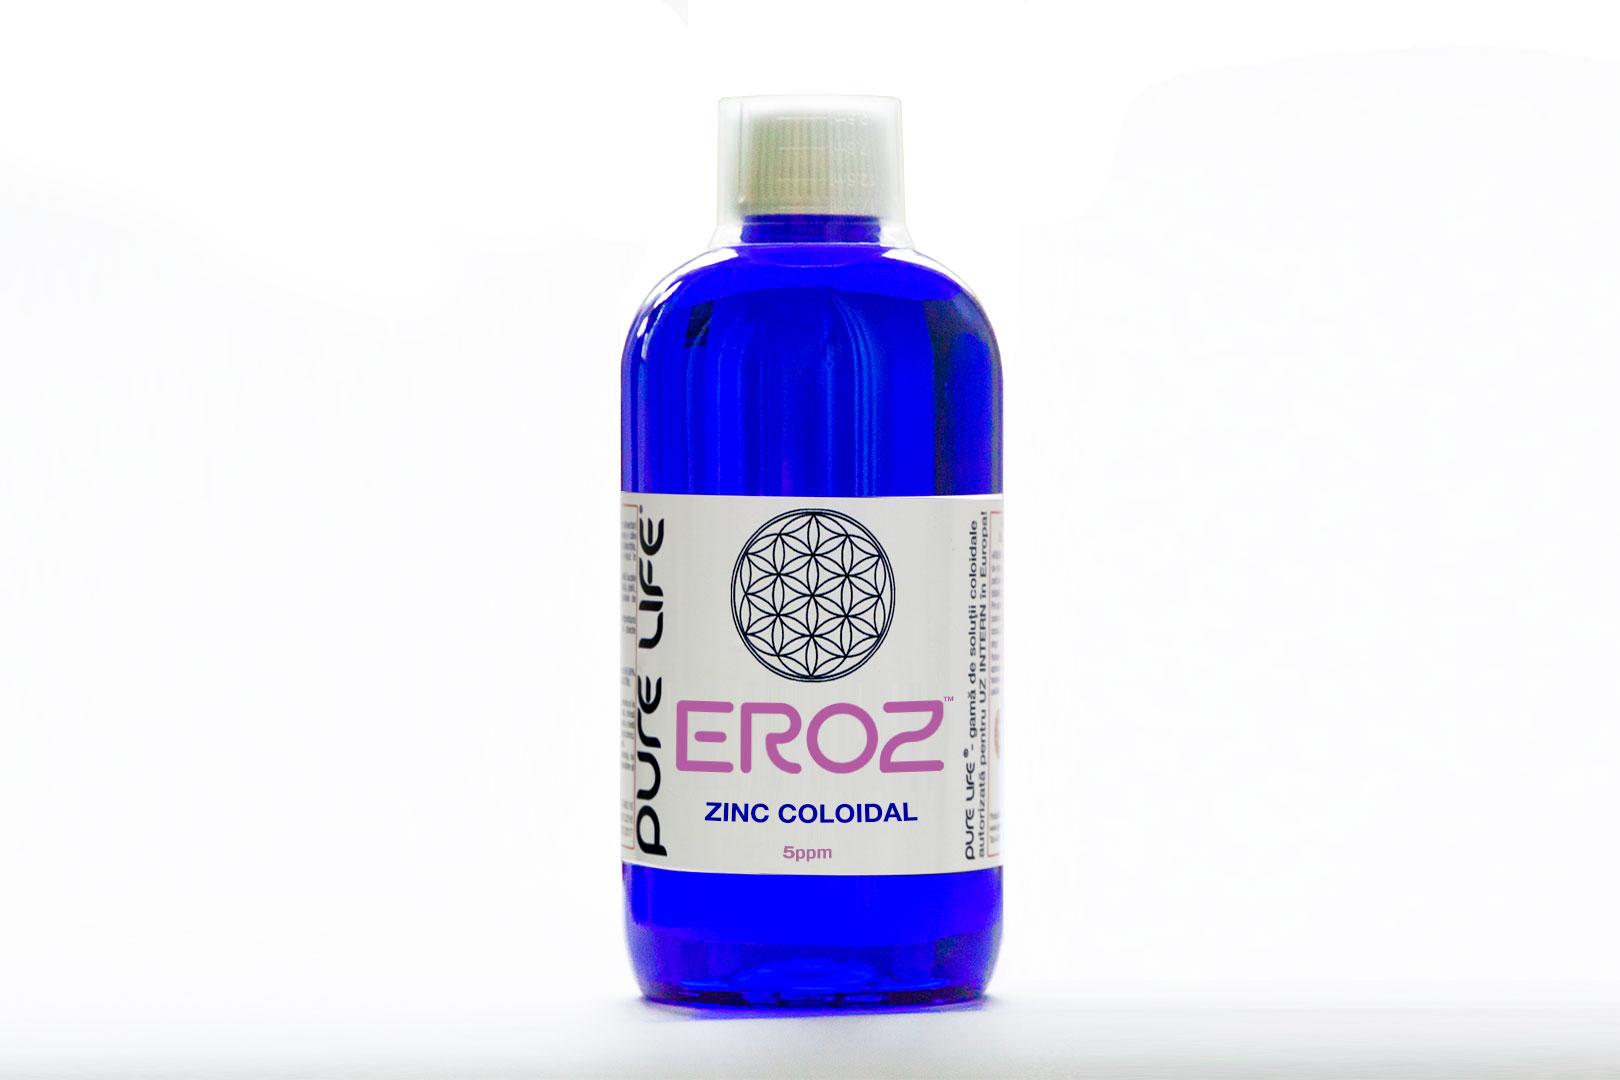 Eroz Zinc Coloidal 480ml